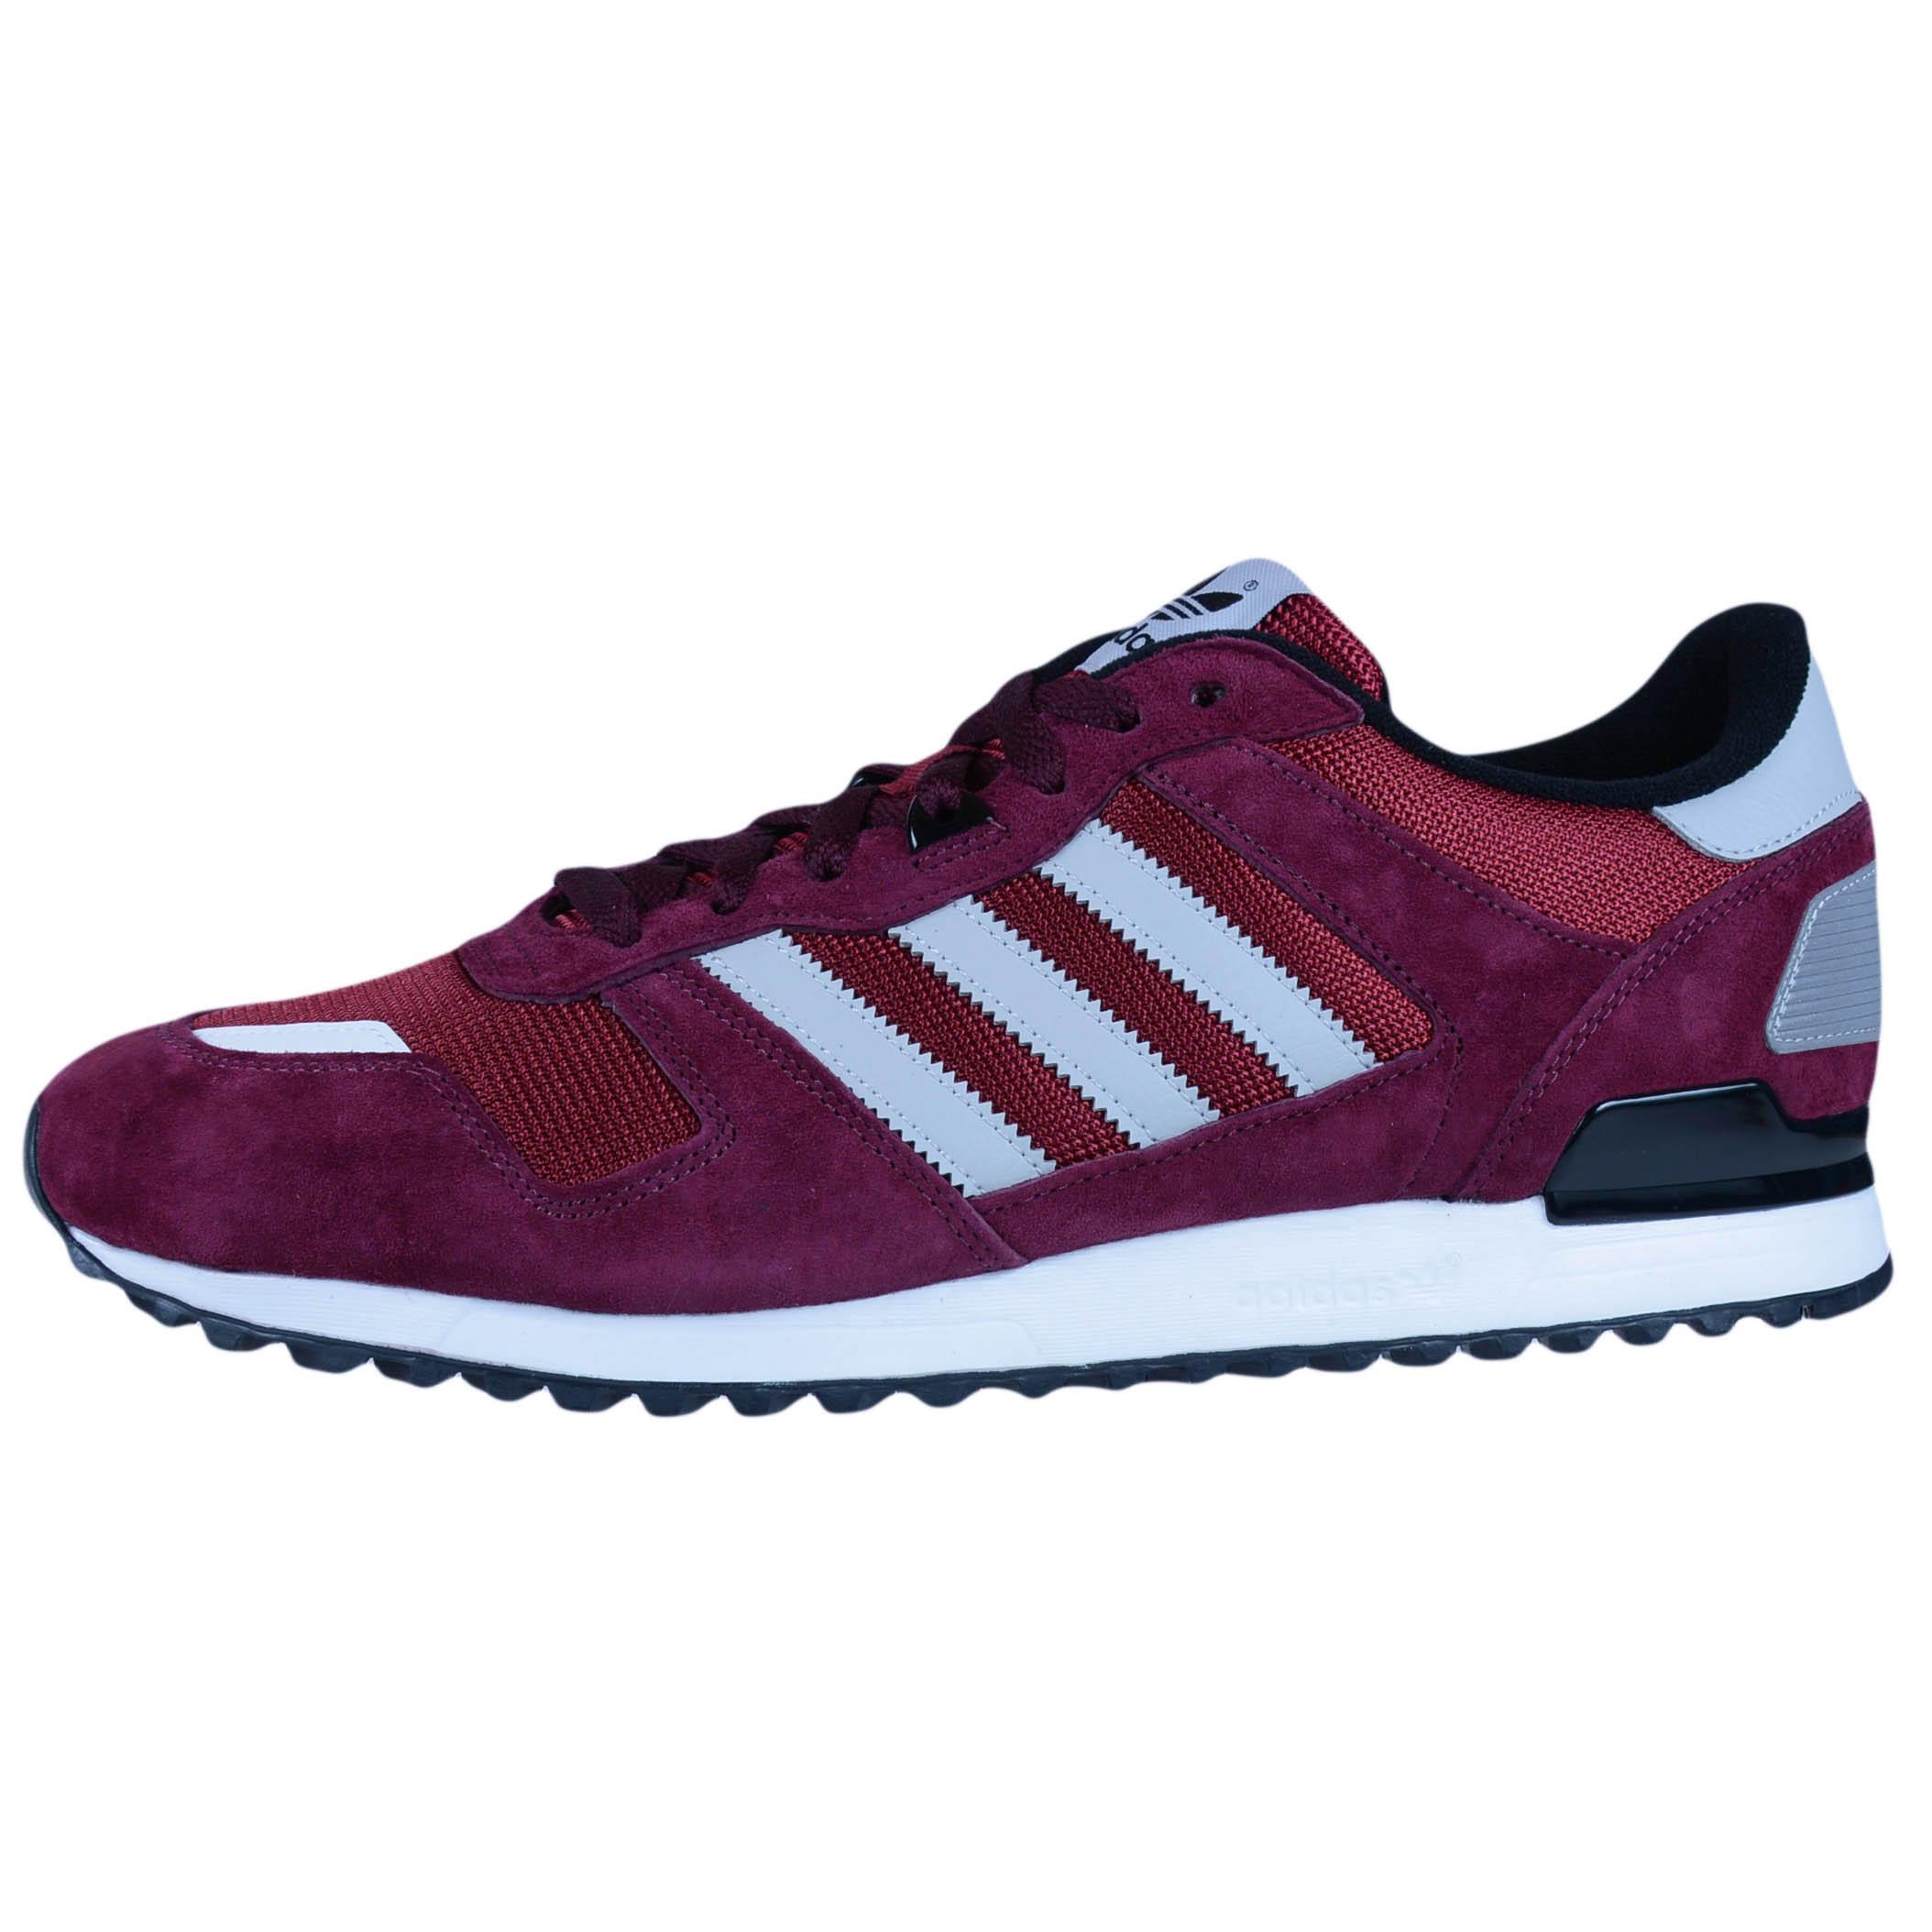 Adidas Liquid Running Shoes